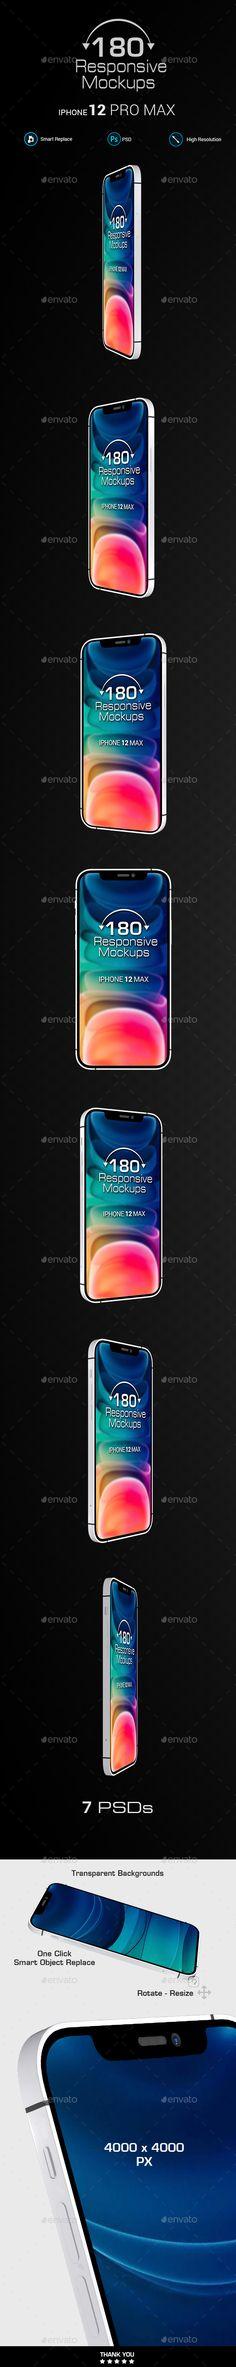 180 Responsive 3D Mockups - Phone 12 Pro Max - White Mockup Templates, Design Templates, Photoshop, Responsive Web, Showcase Design, Retro, Free Design, 3d, Purpose